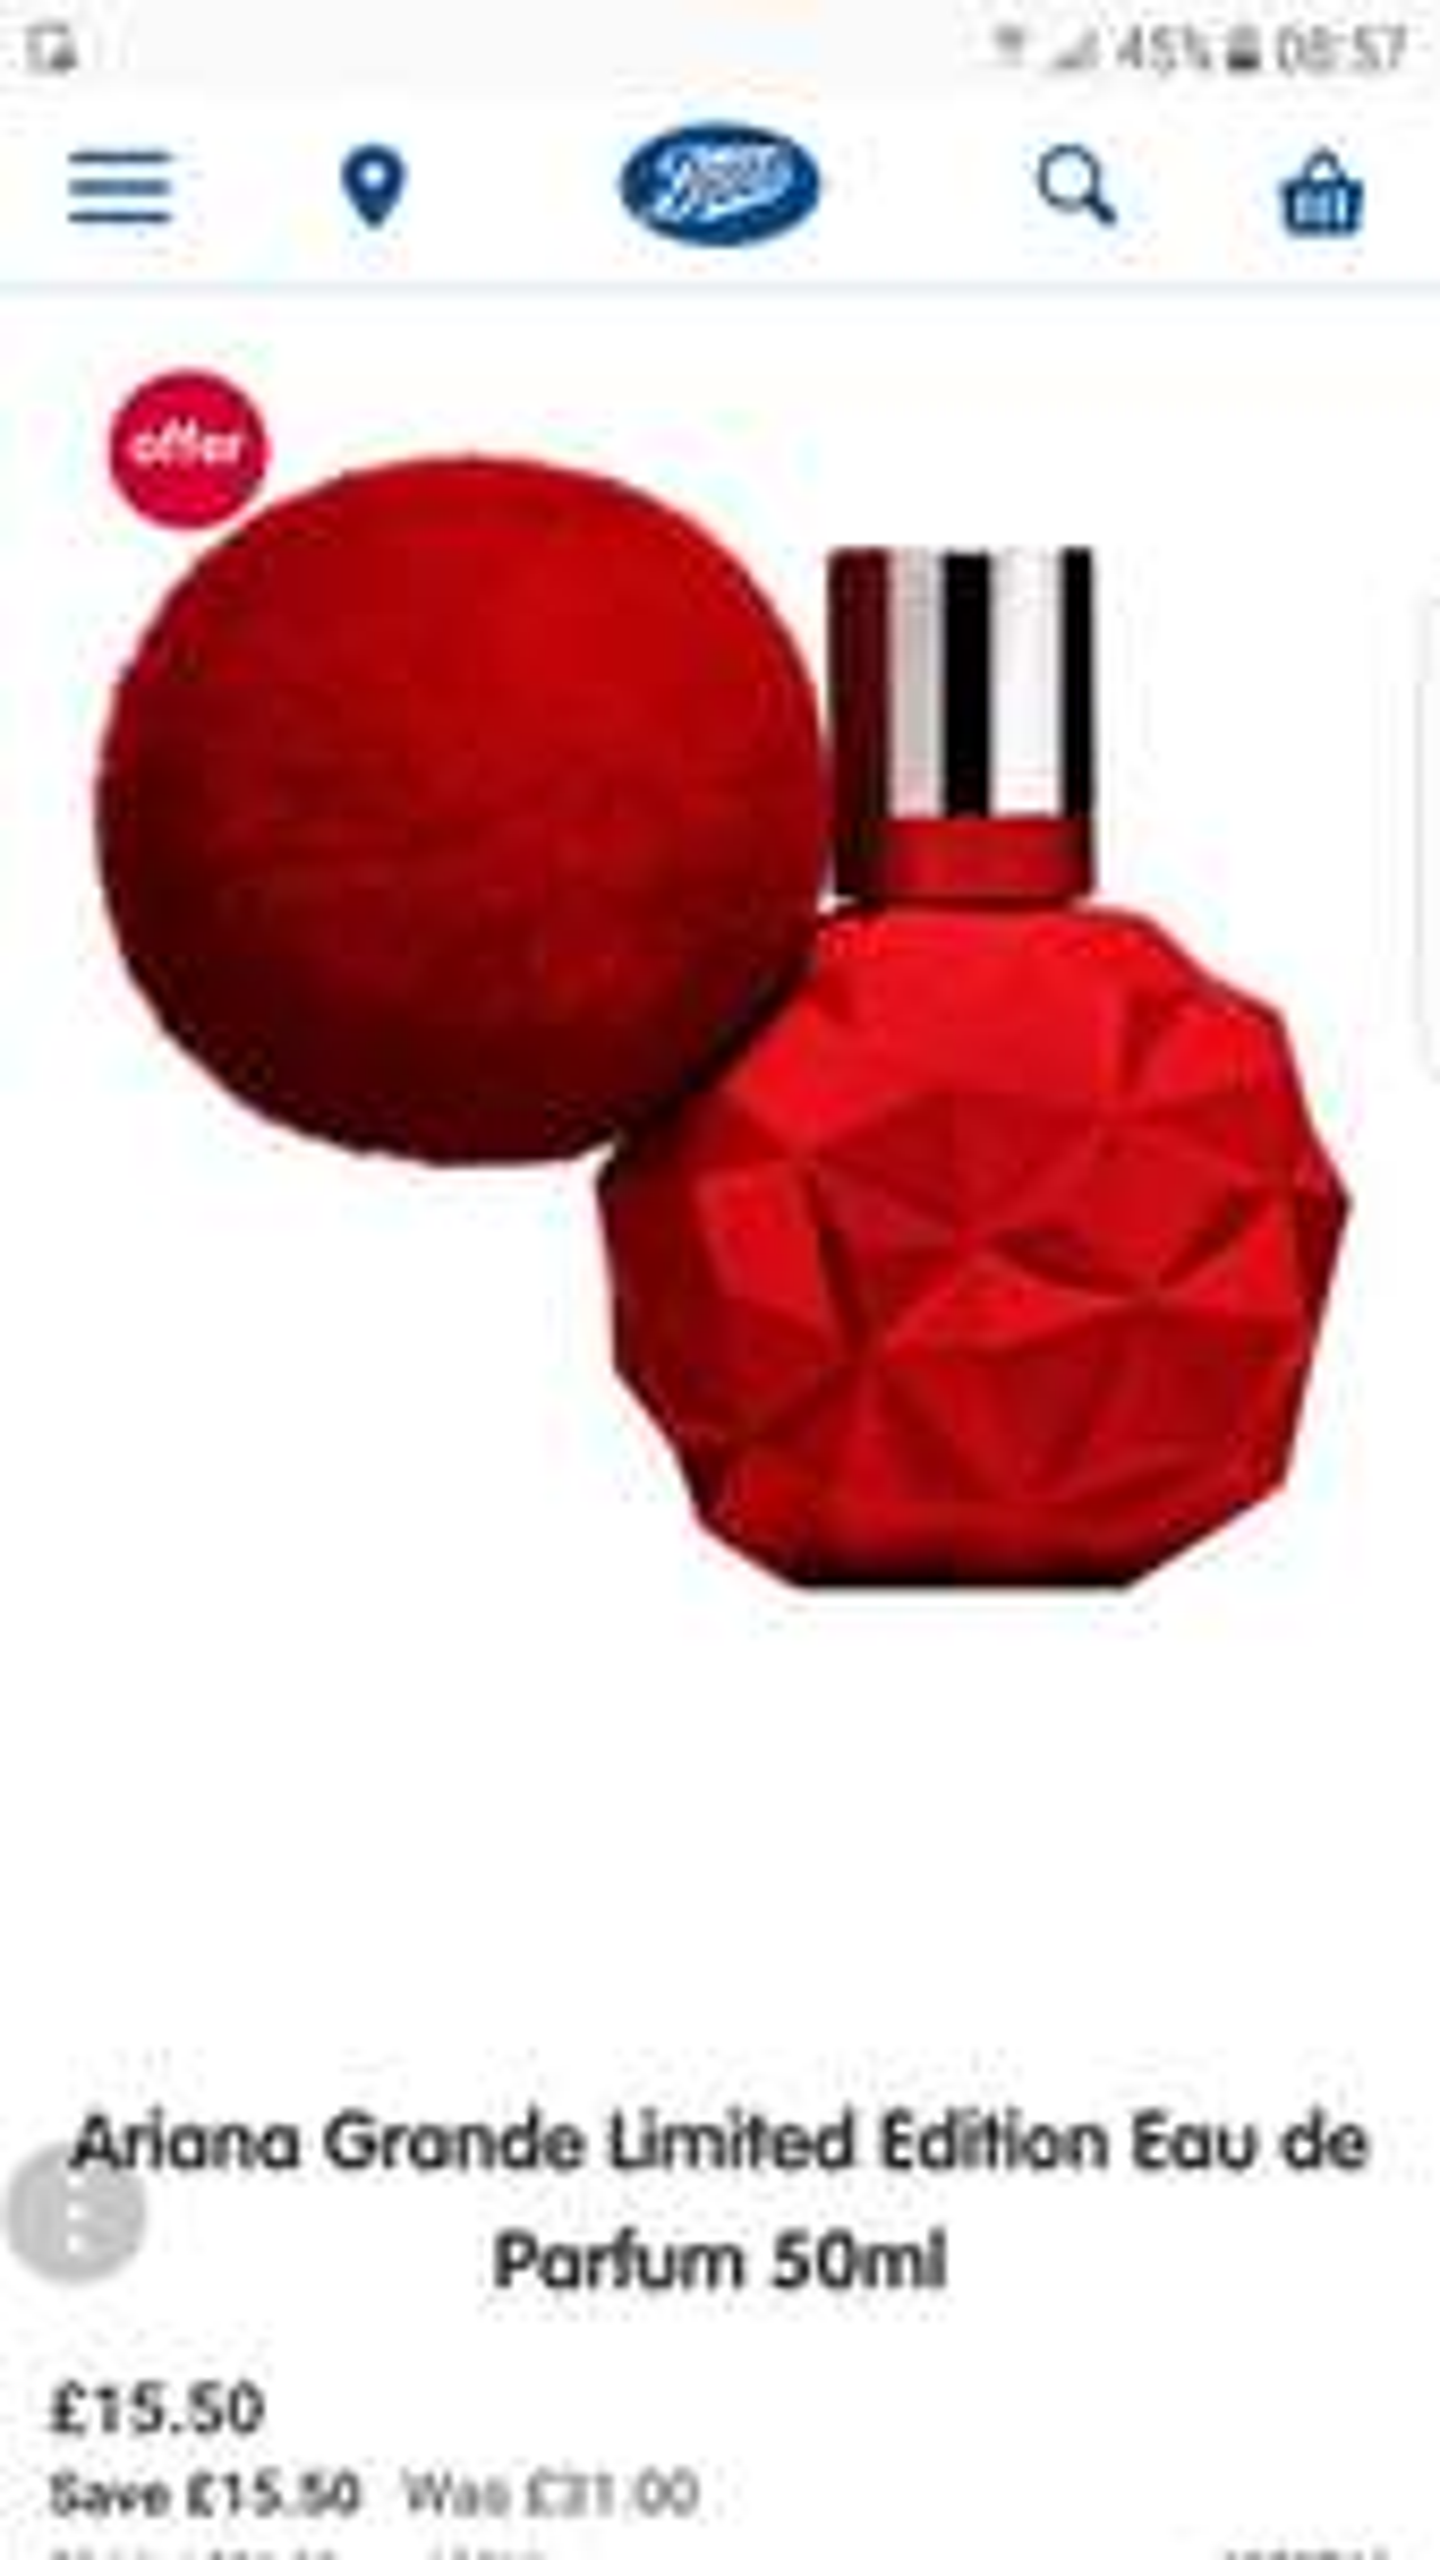 Ariana Grande Limited Edition Eau de Parfum 50ml £15.50 @ Boots